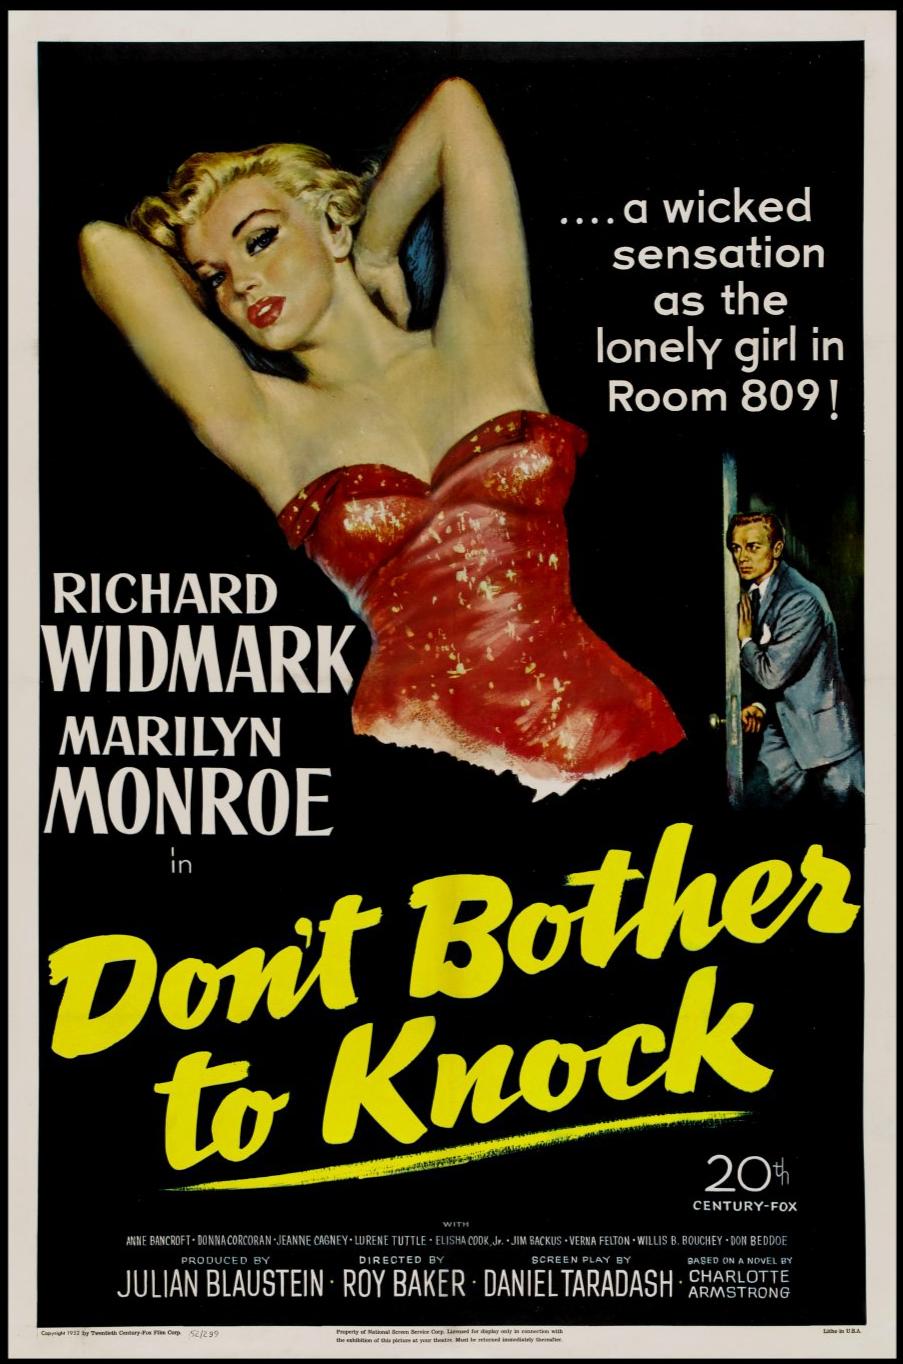 roy-baker-don-t-bother-to-knock-starring-marilyn-monroe-richard-widmark-anne-bancroft-movie-poster-1952